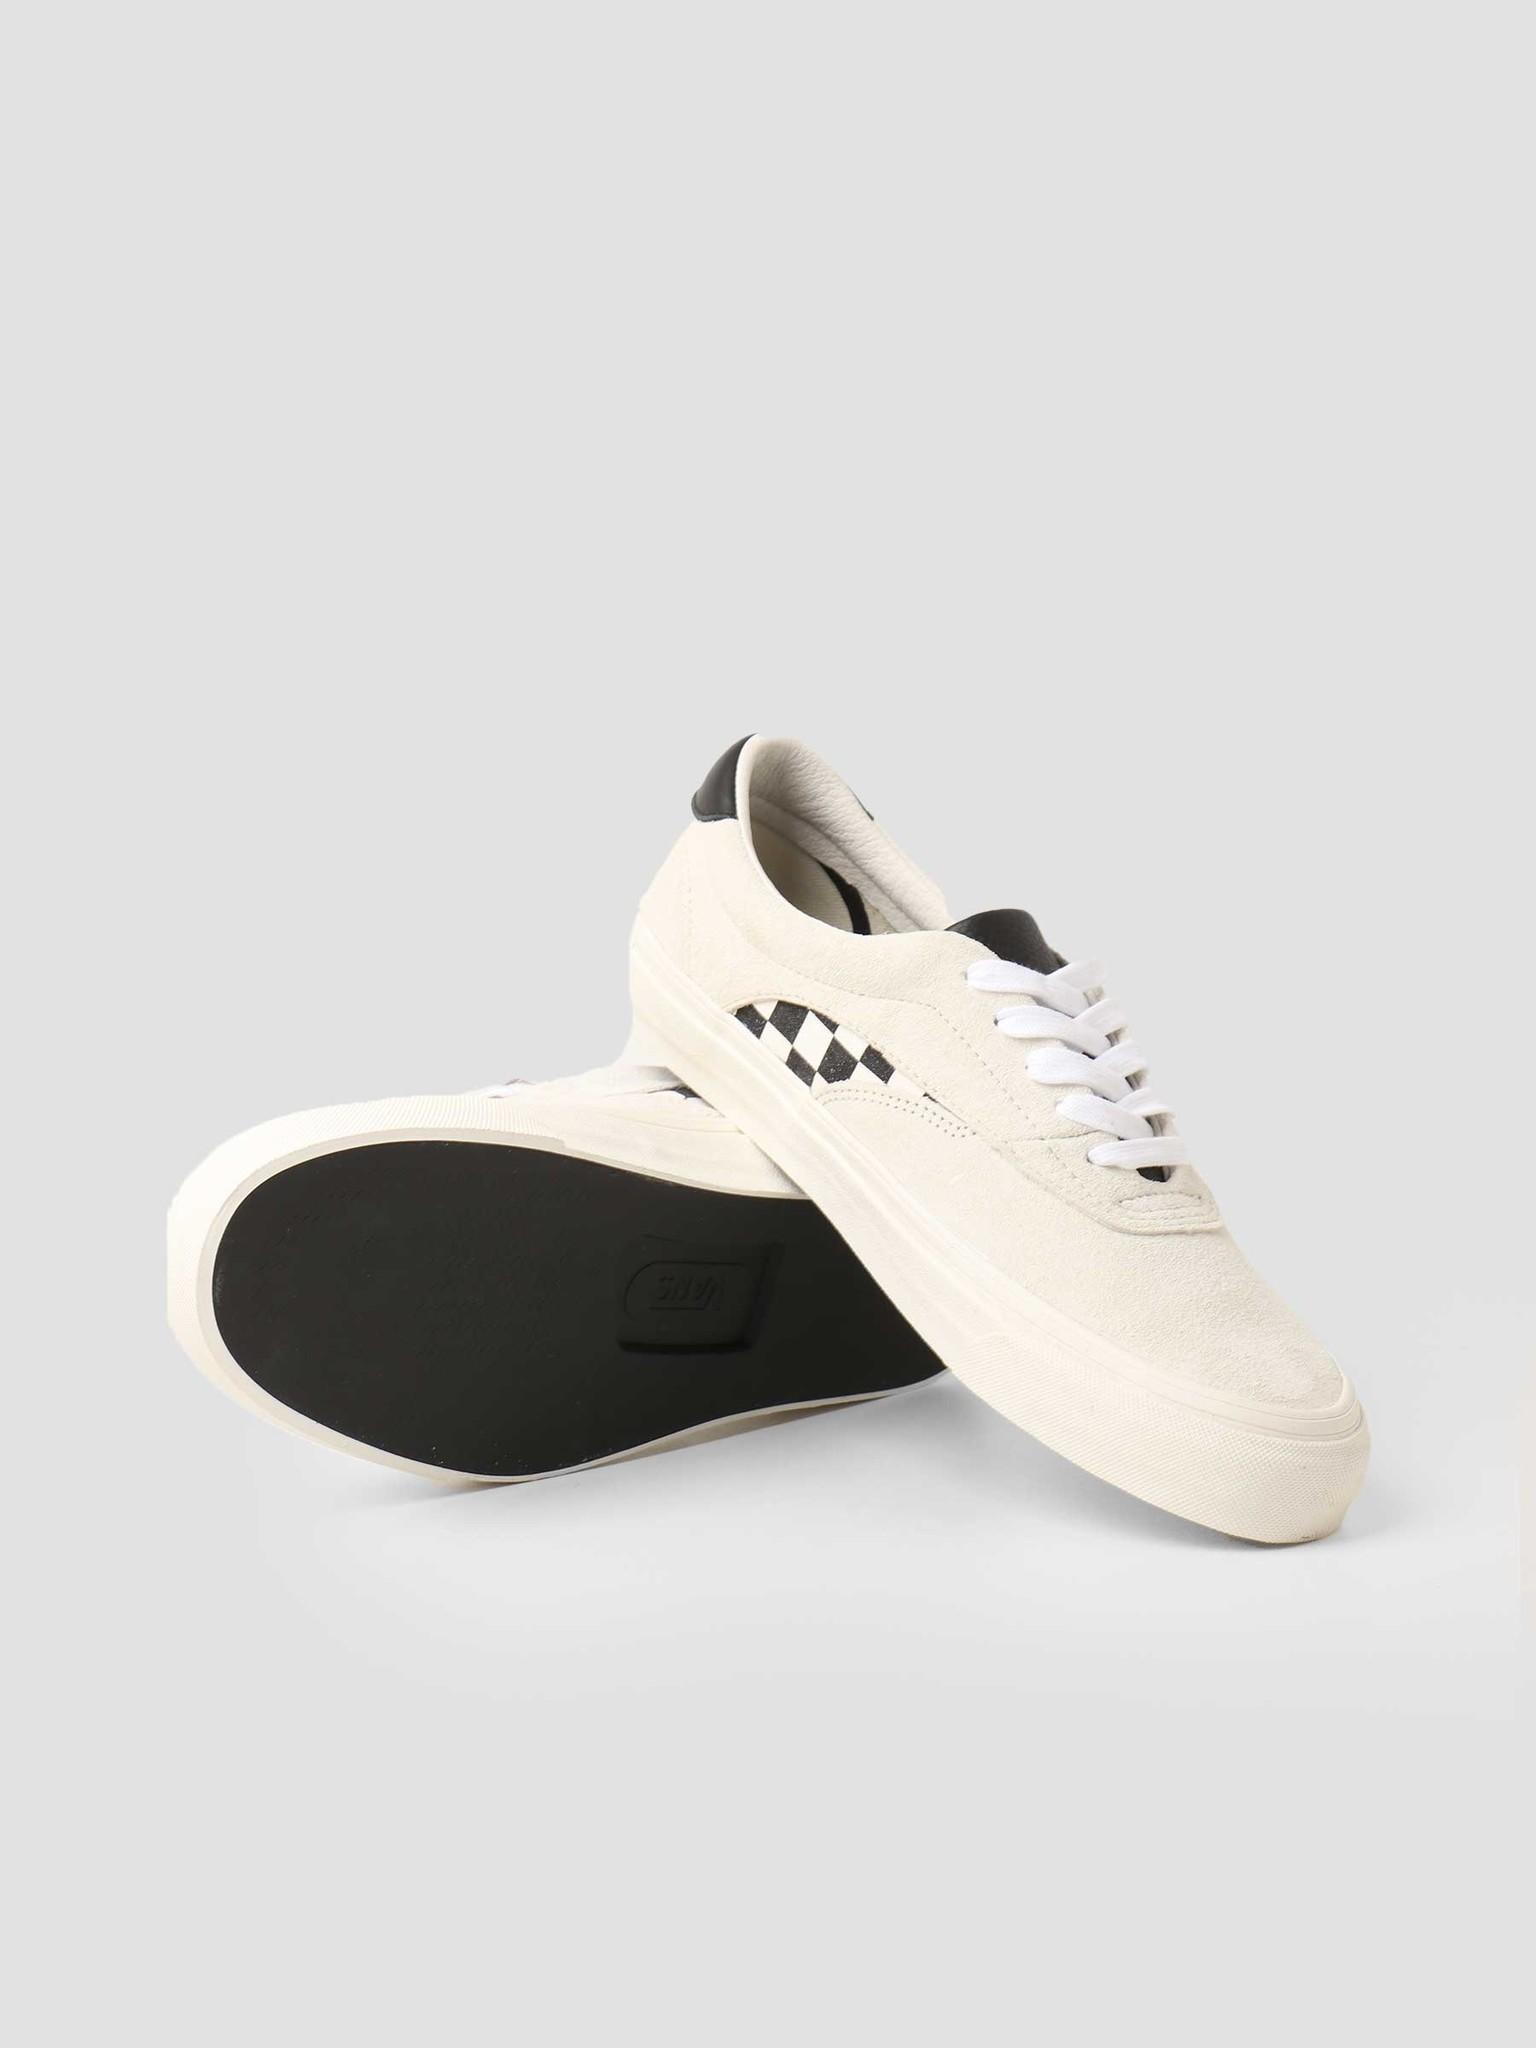 Vans Vans Acer Ni Sp Marshmalow Black VN0A4UWY17S1